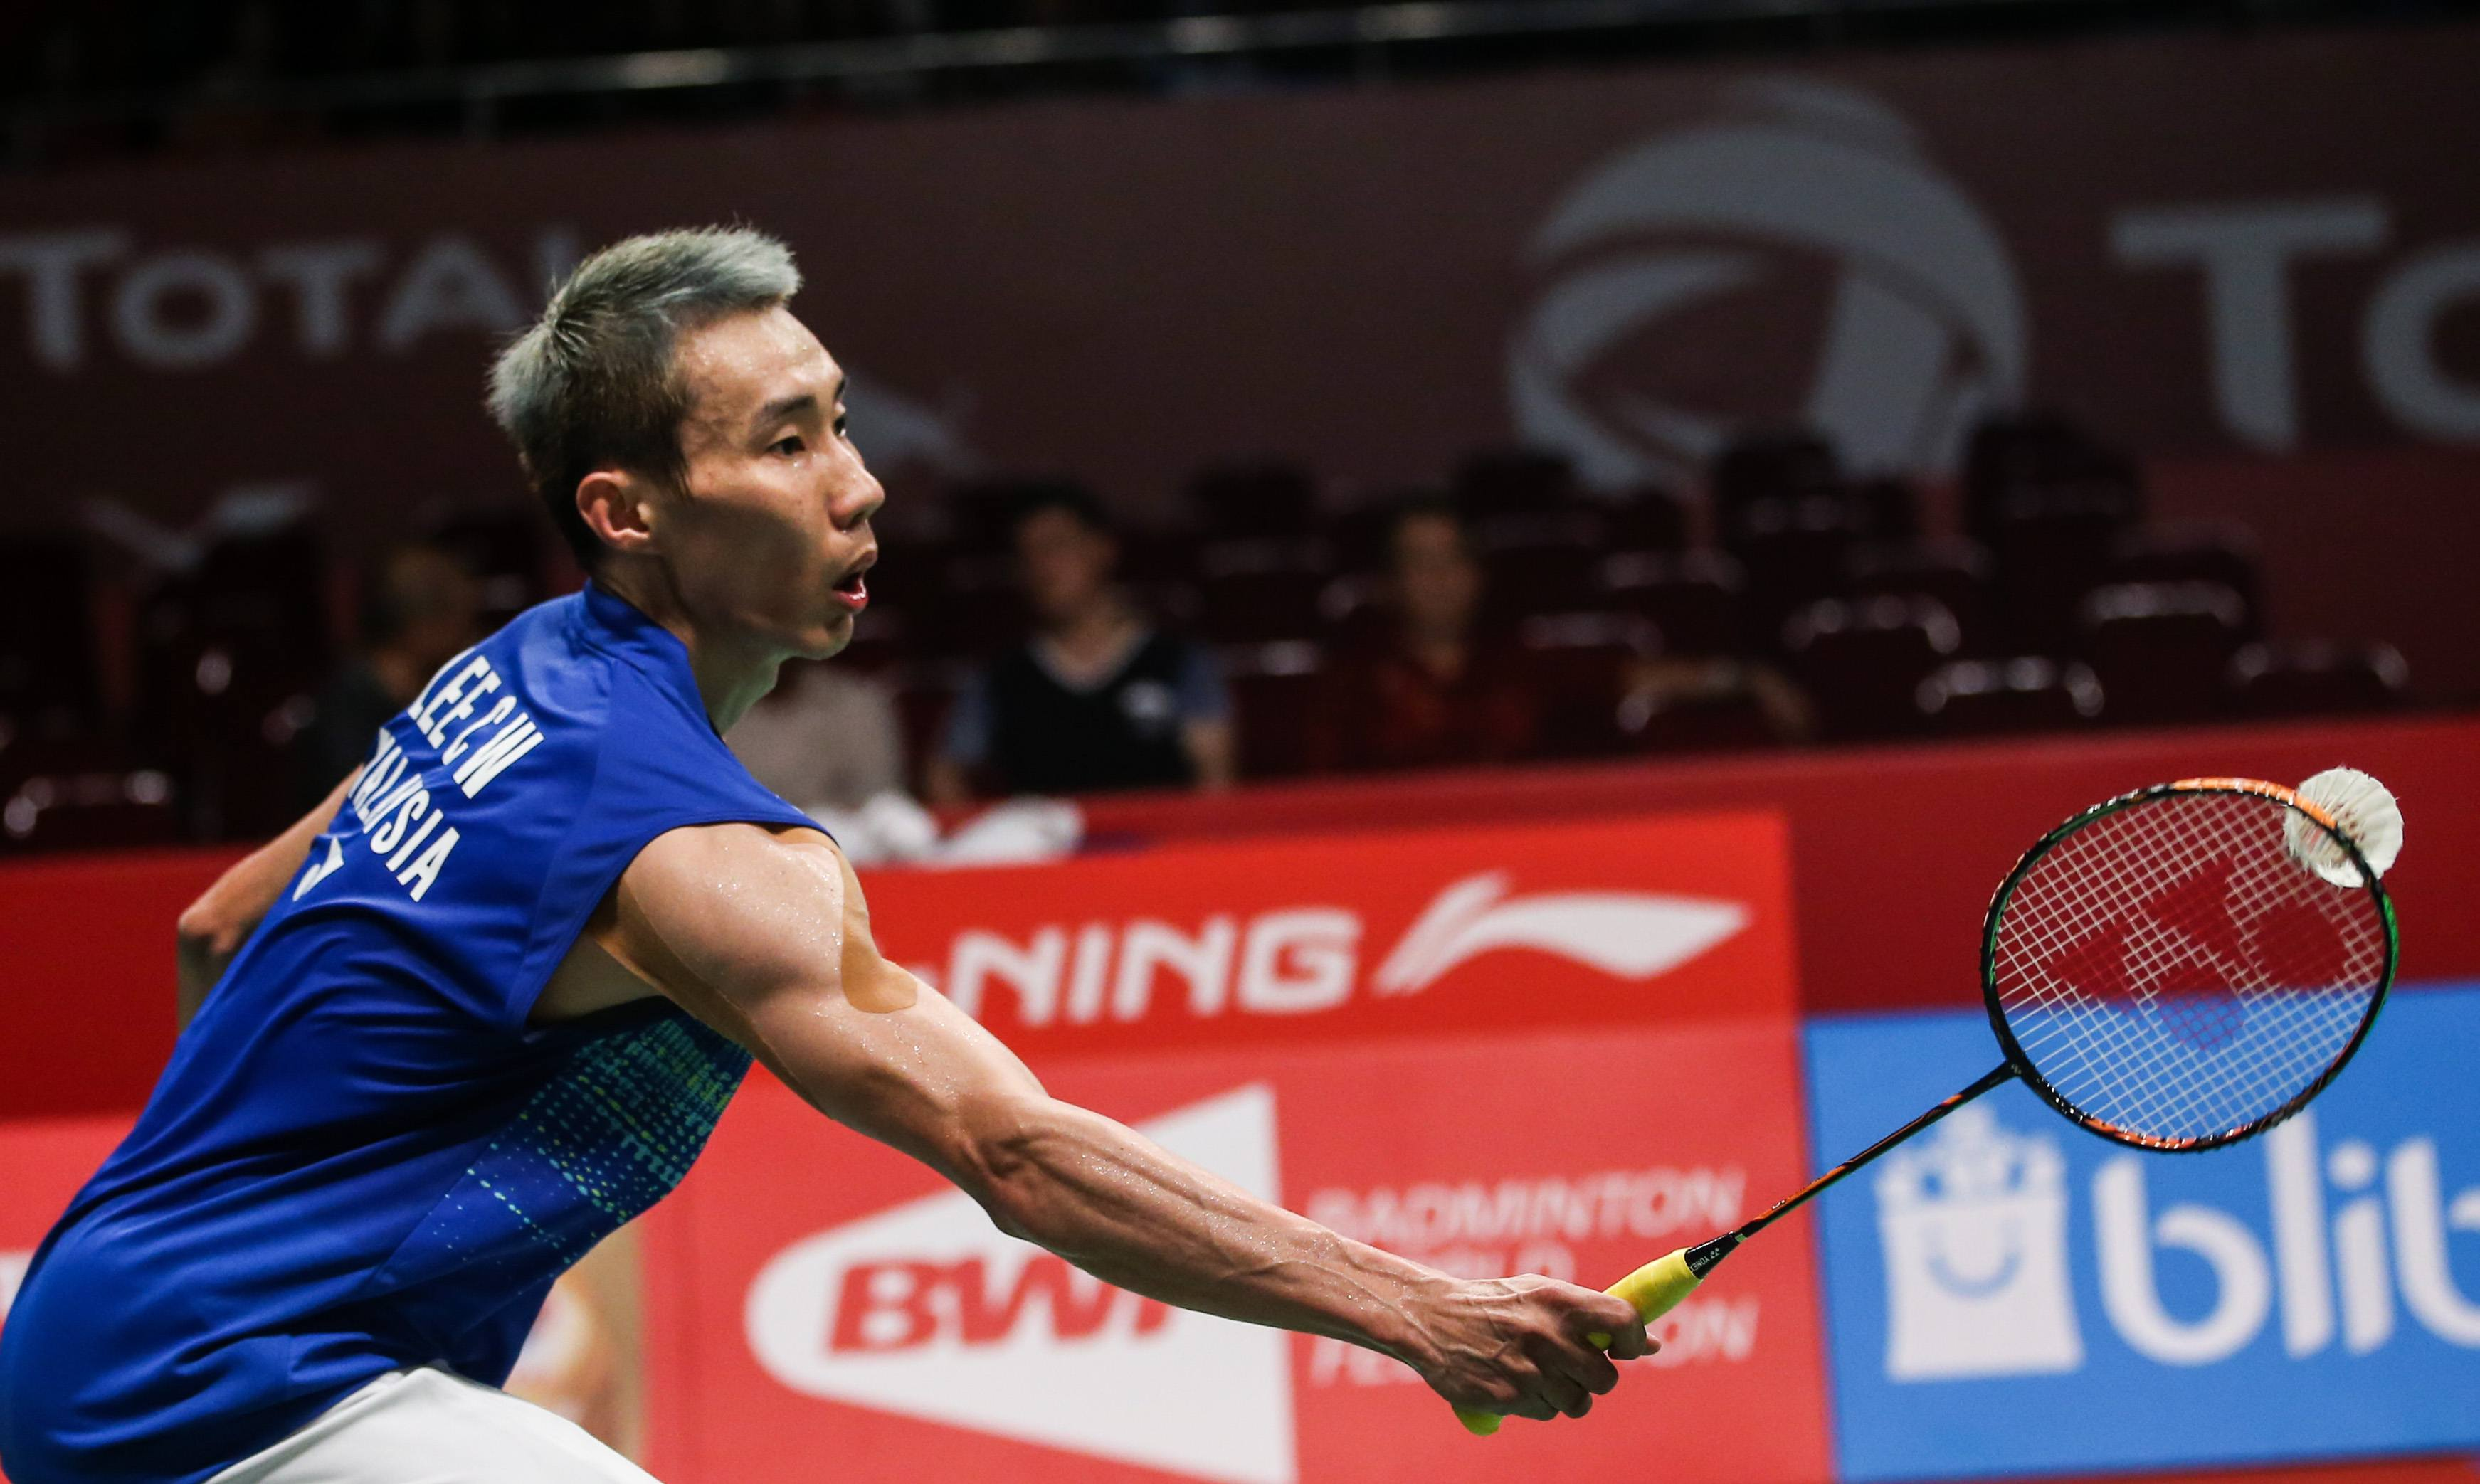 Mizuno badmintonsko passer OGSÅ til dig